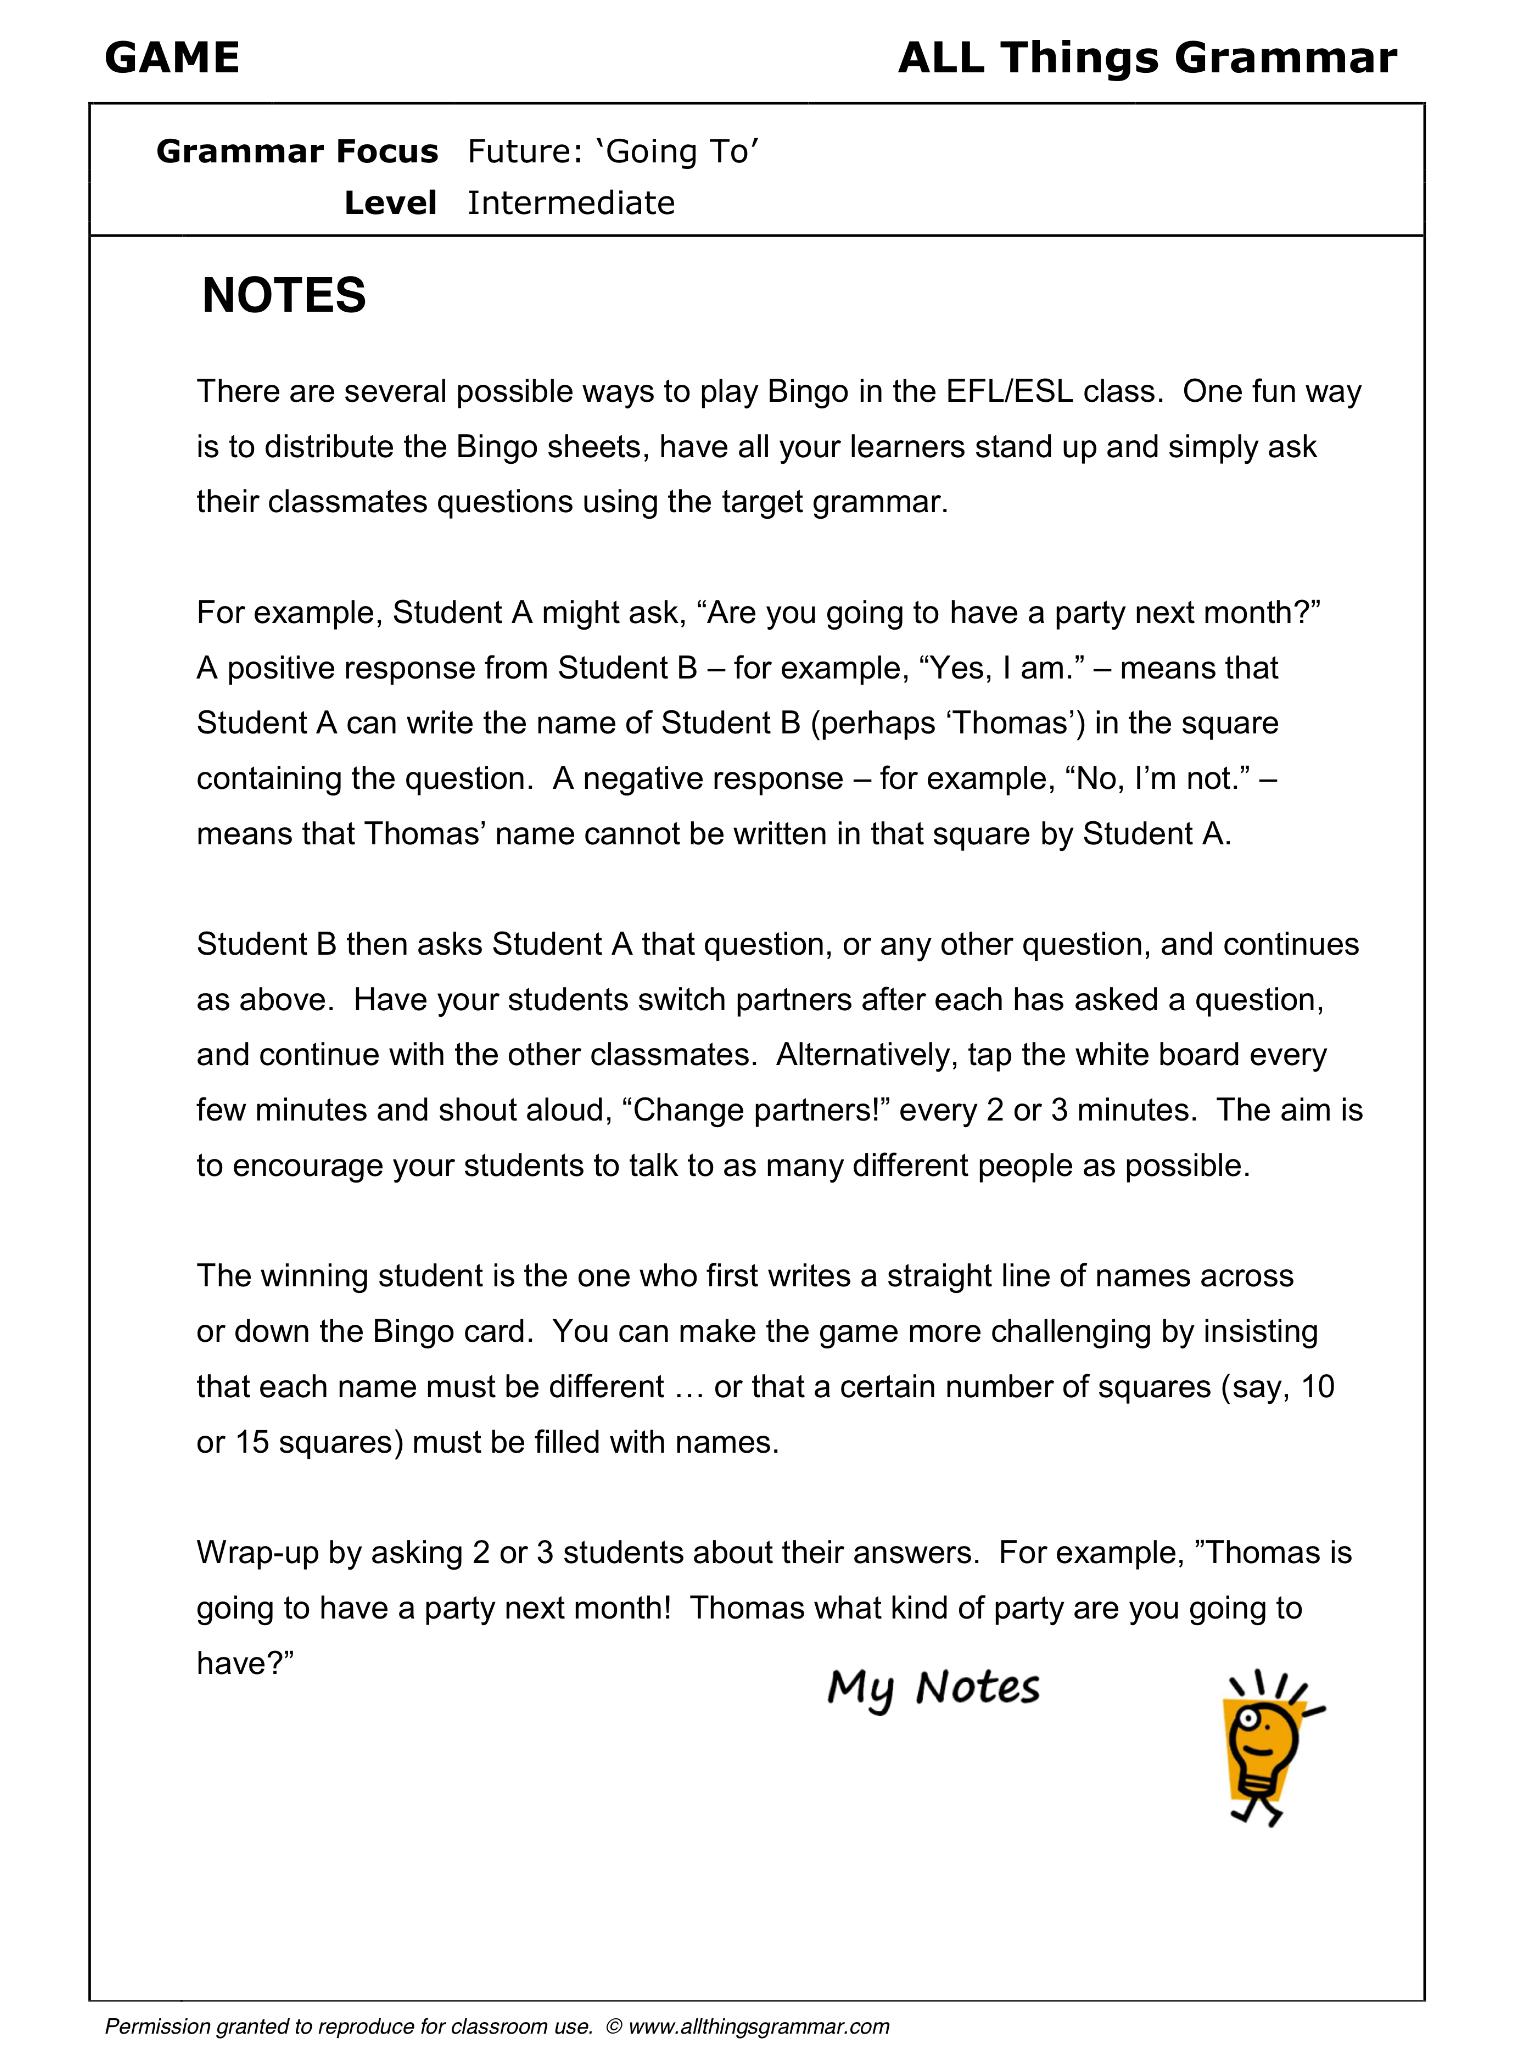 English Grammar Future: Going To www.allthingsgrammar.com/future ...